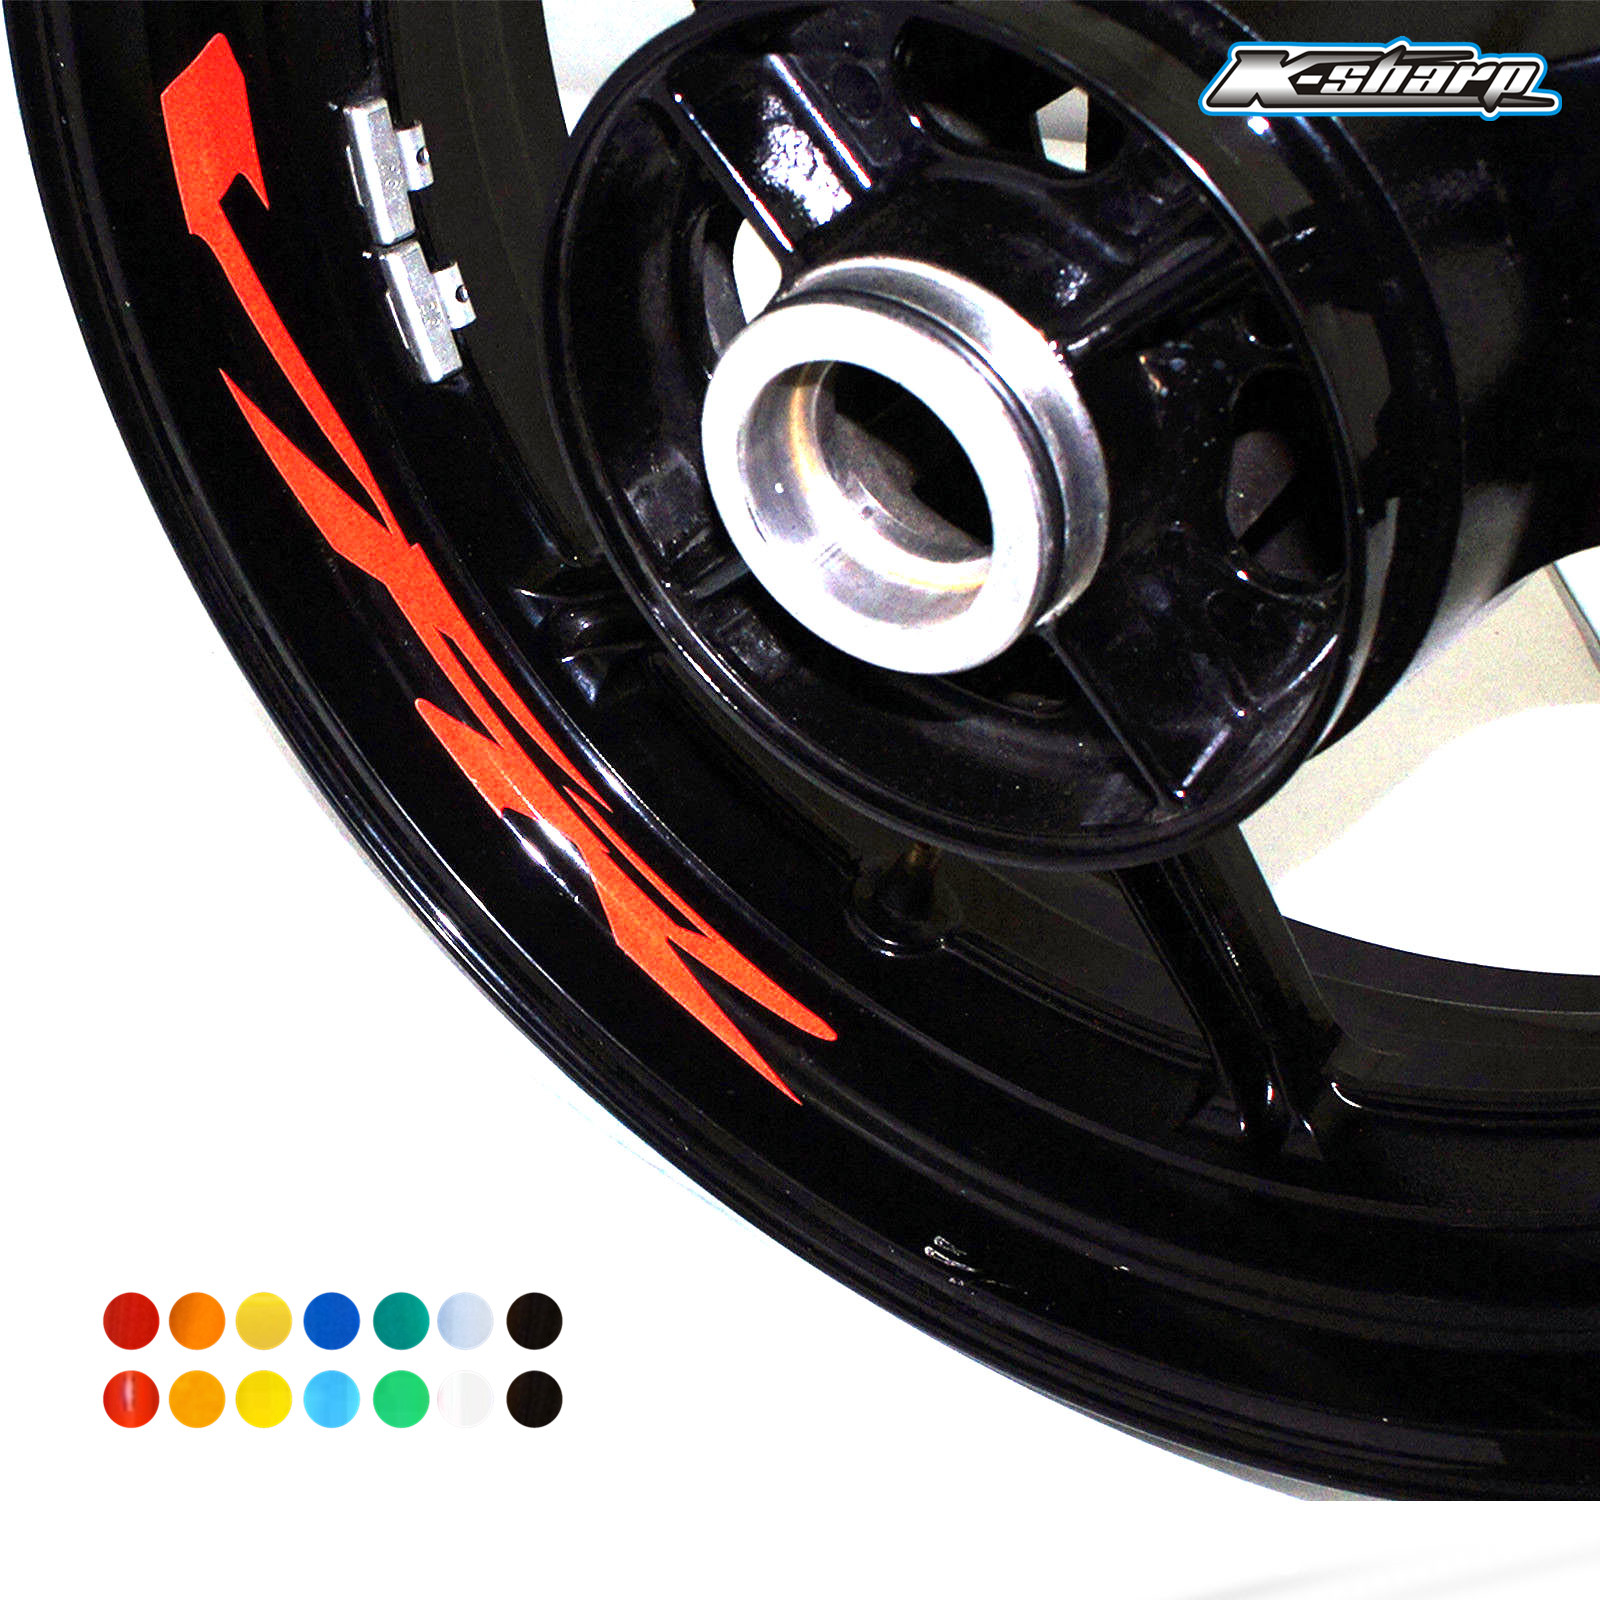 8 X Custon Inner Rim Decals Wheel Reflective Sign Stickers Stripes FIT HONDA VFR